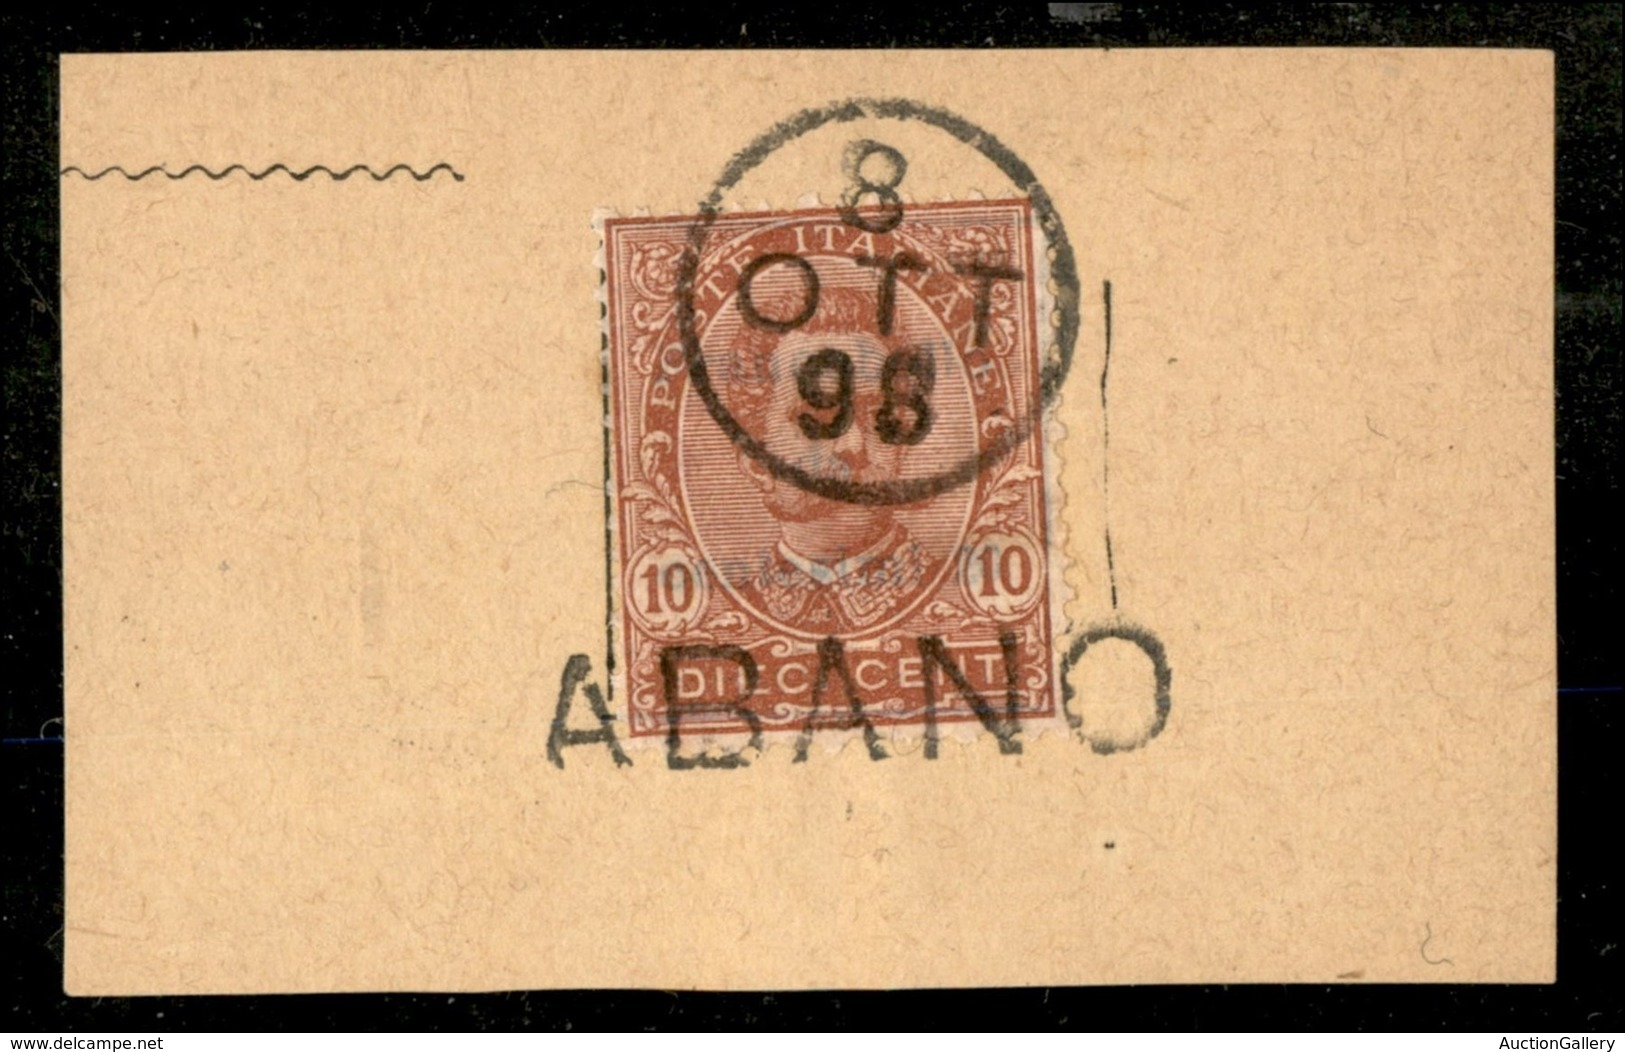 20745 REGNO D'ITALIA - UMBERTO I - Abano + Muto A Data (8.10.98) – 10 Cent Umberto (60) Su Frammento - Briefmarken